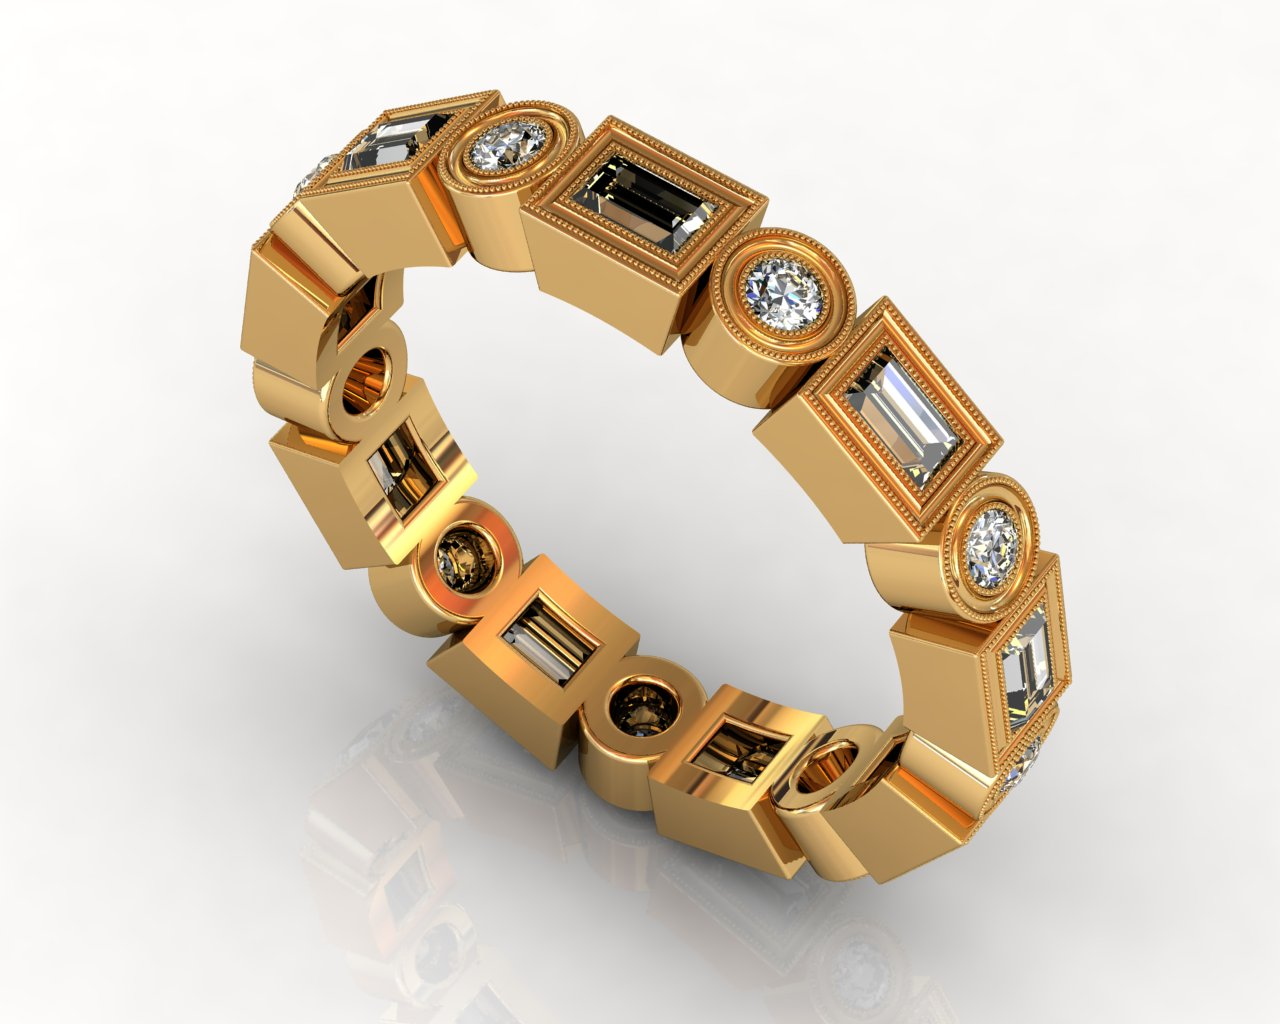 Wedding Bands Ladies South Bay Gold Diamonds Bezel 18 Stone 0.77 TCW Diamonds 5.16g 18kt White Gold